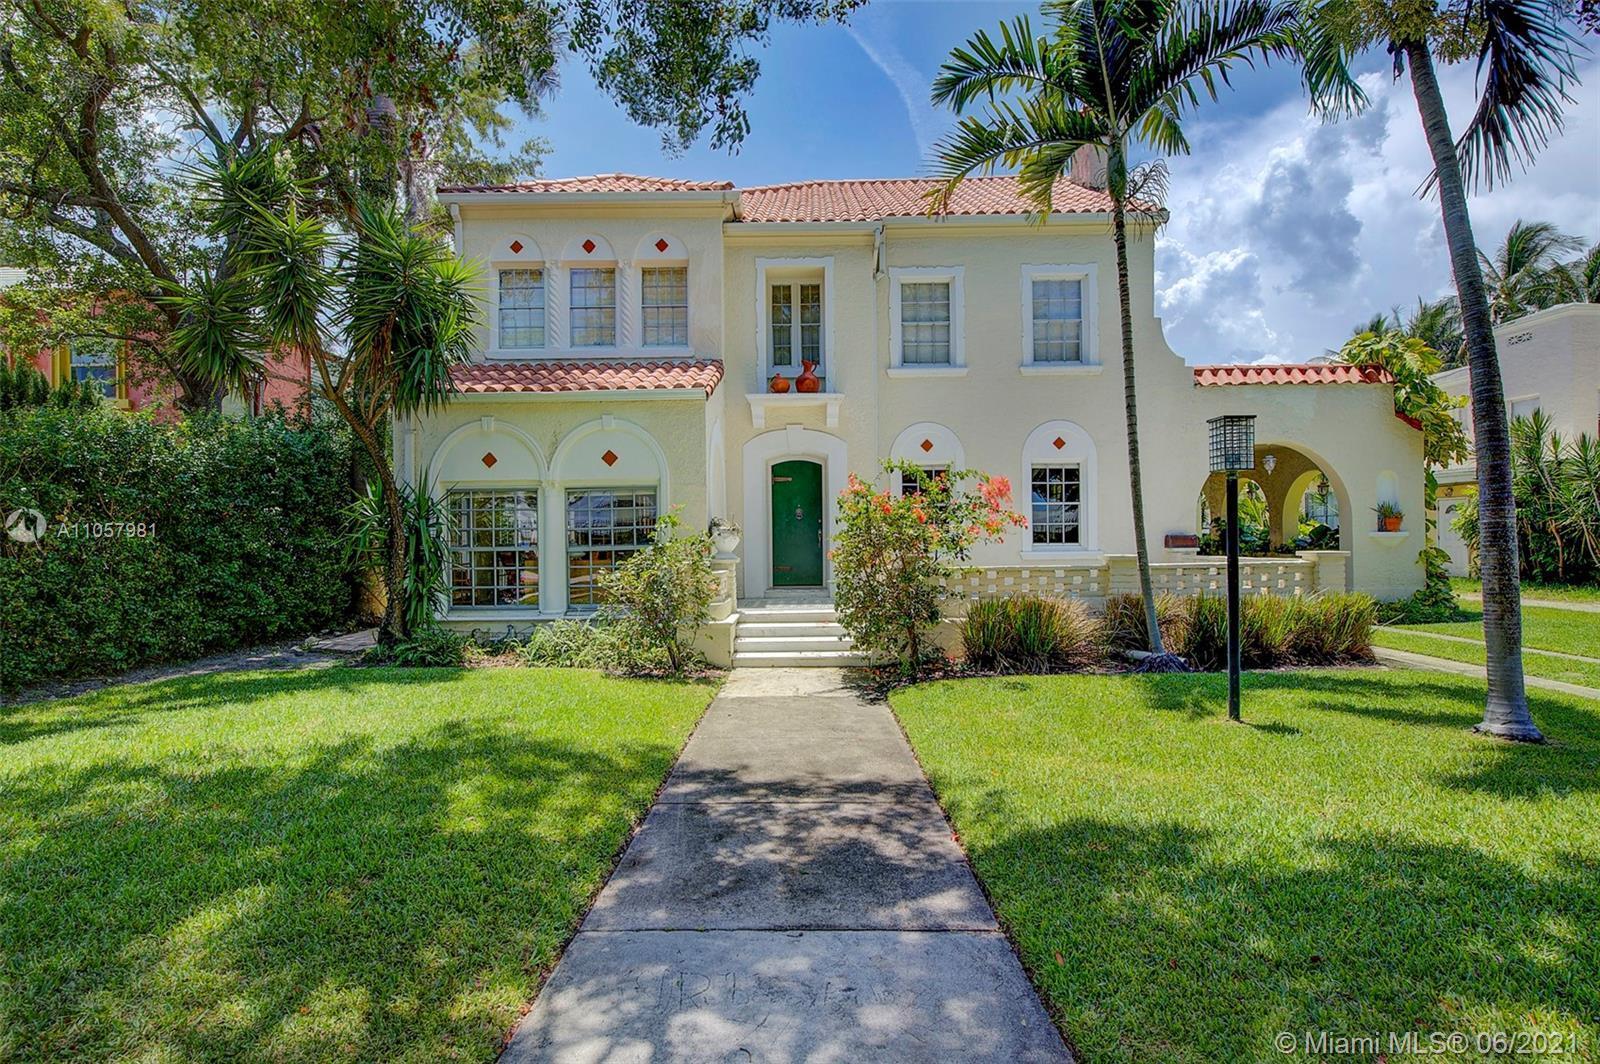 Historic gem of Italian Renaissance inspired architecture nestled on Miami Beach's picturesque Prair